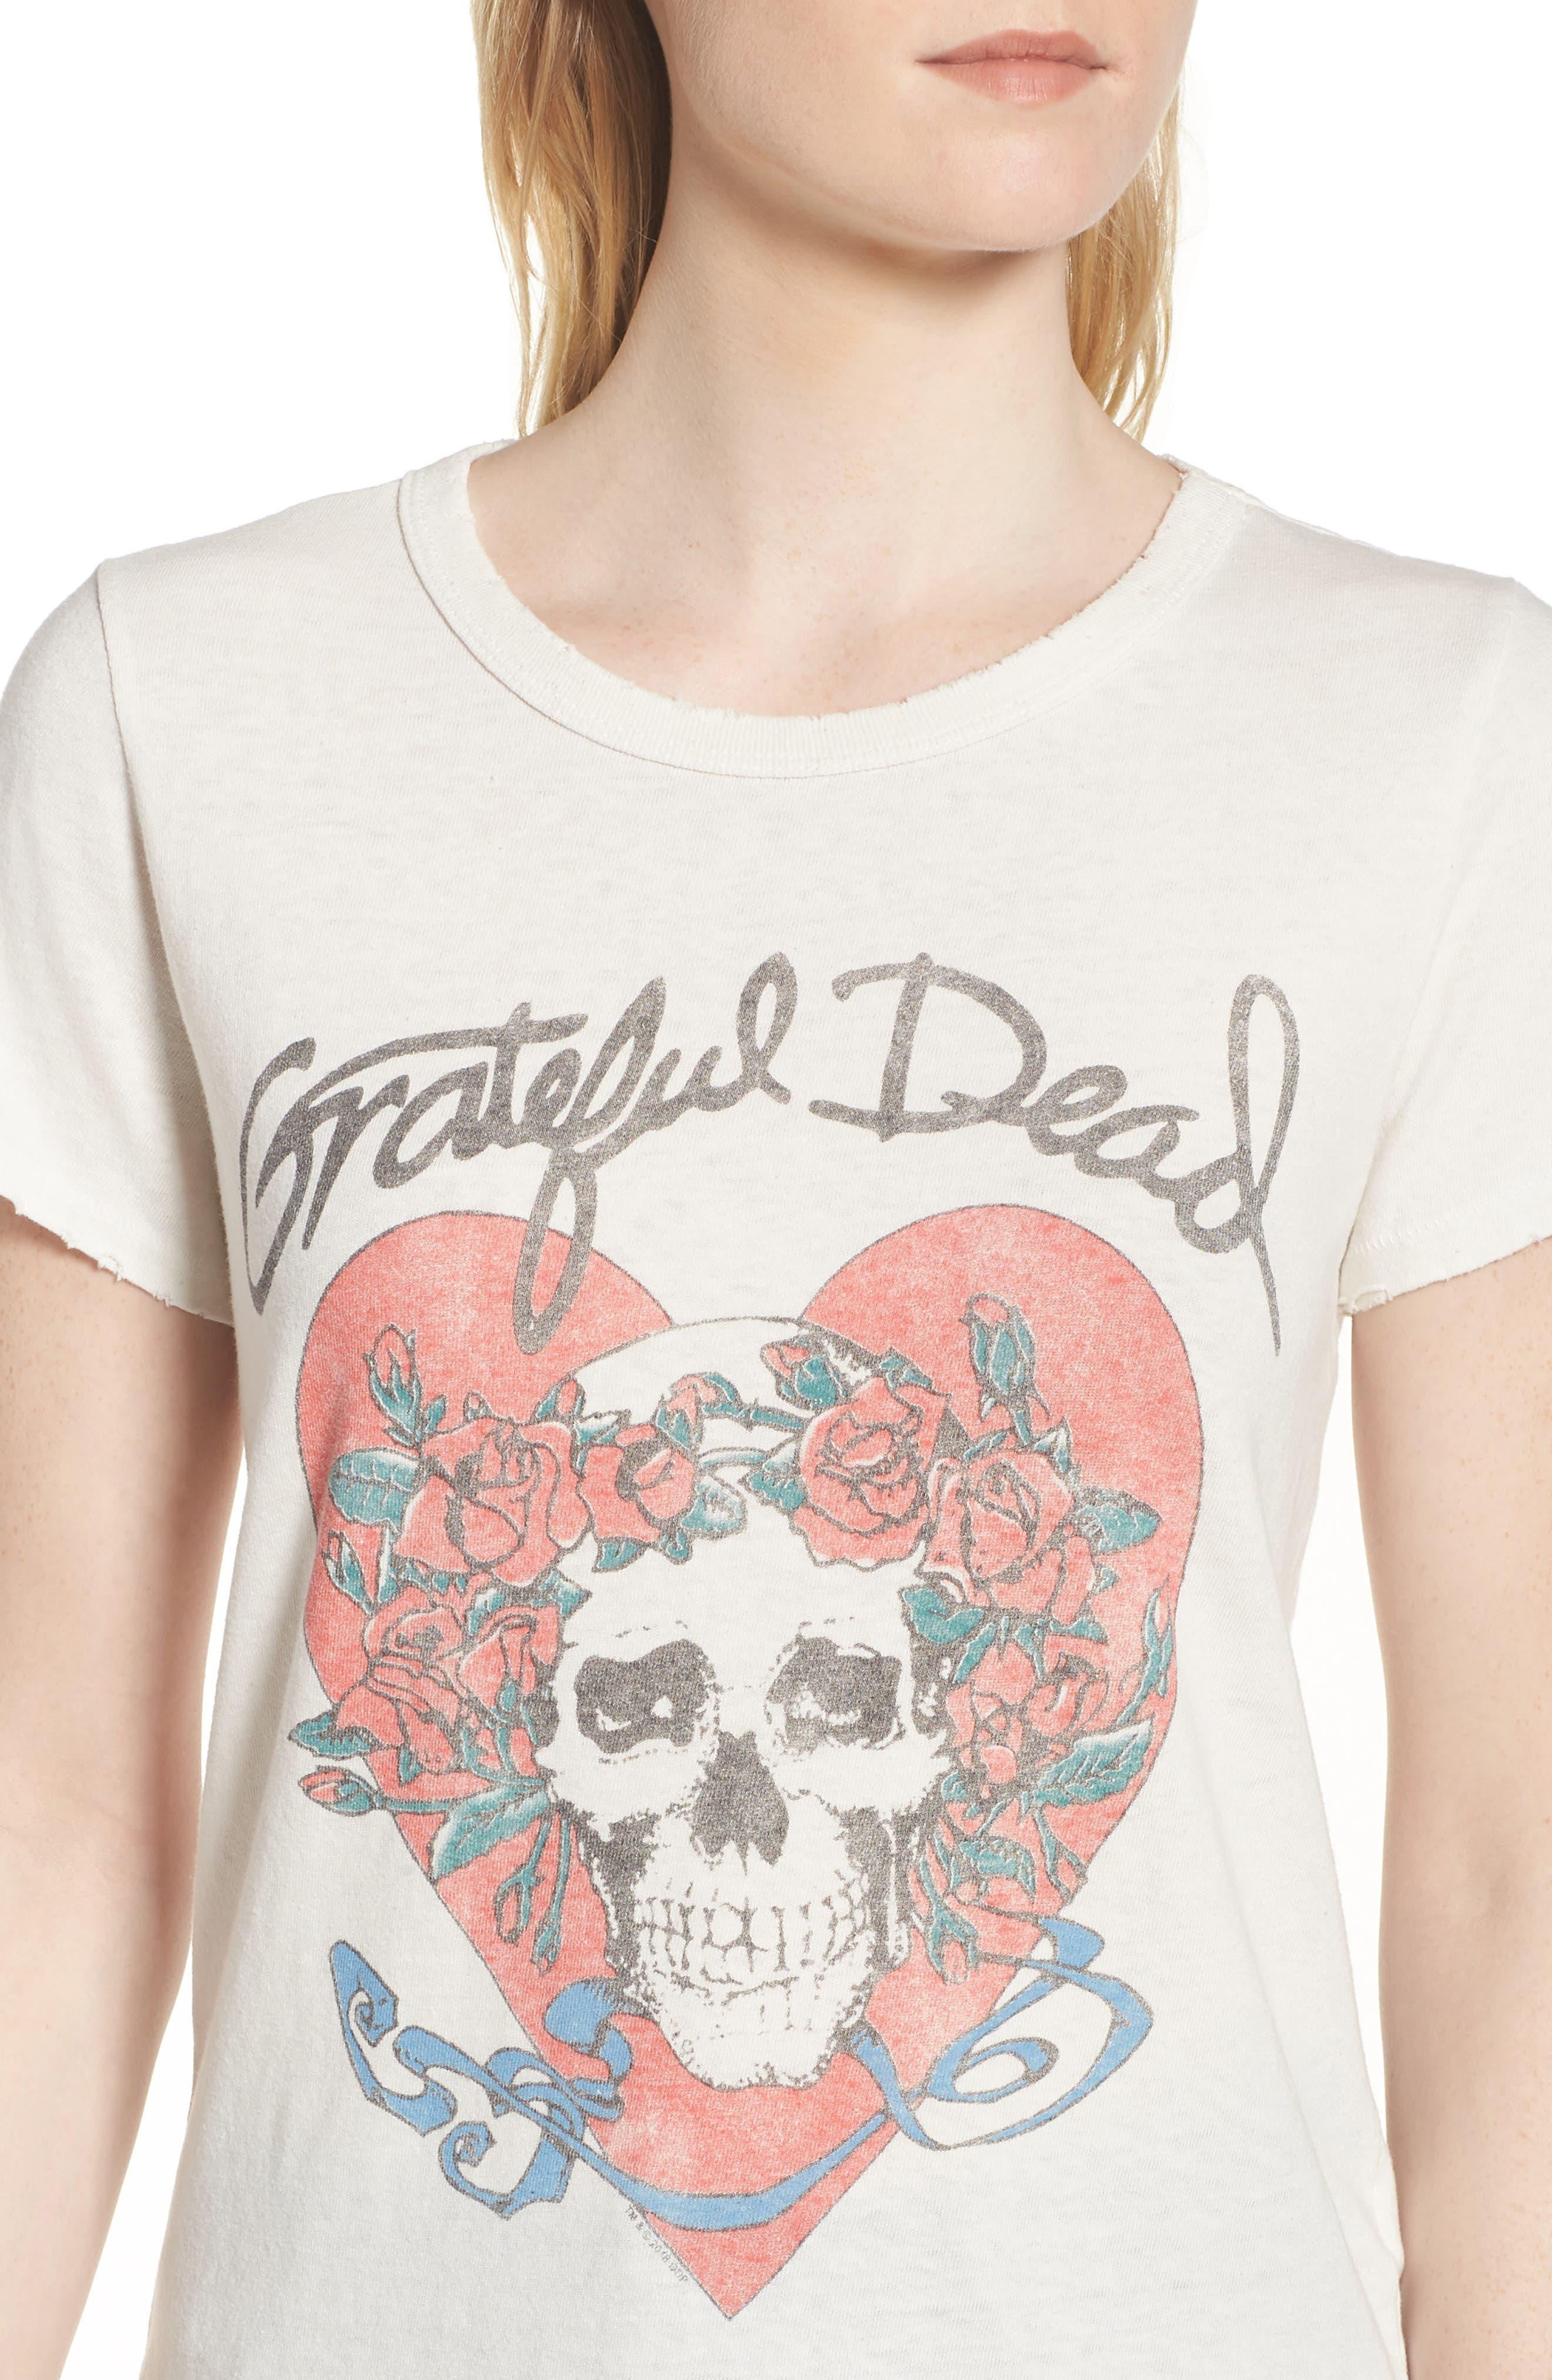 Grateful Dead Tee,                             Alternate thumbnail 4, color,